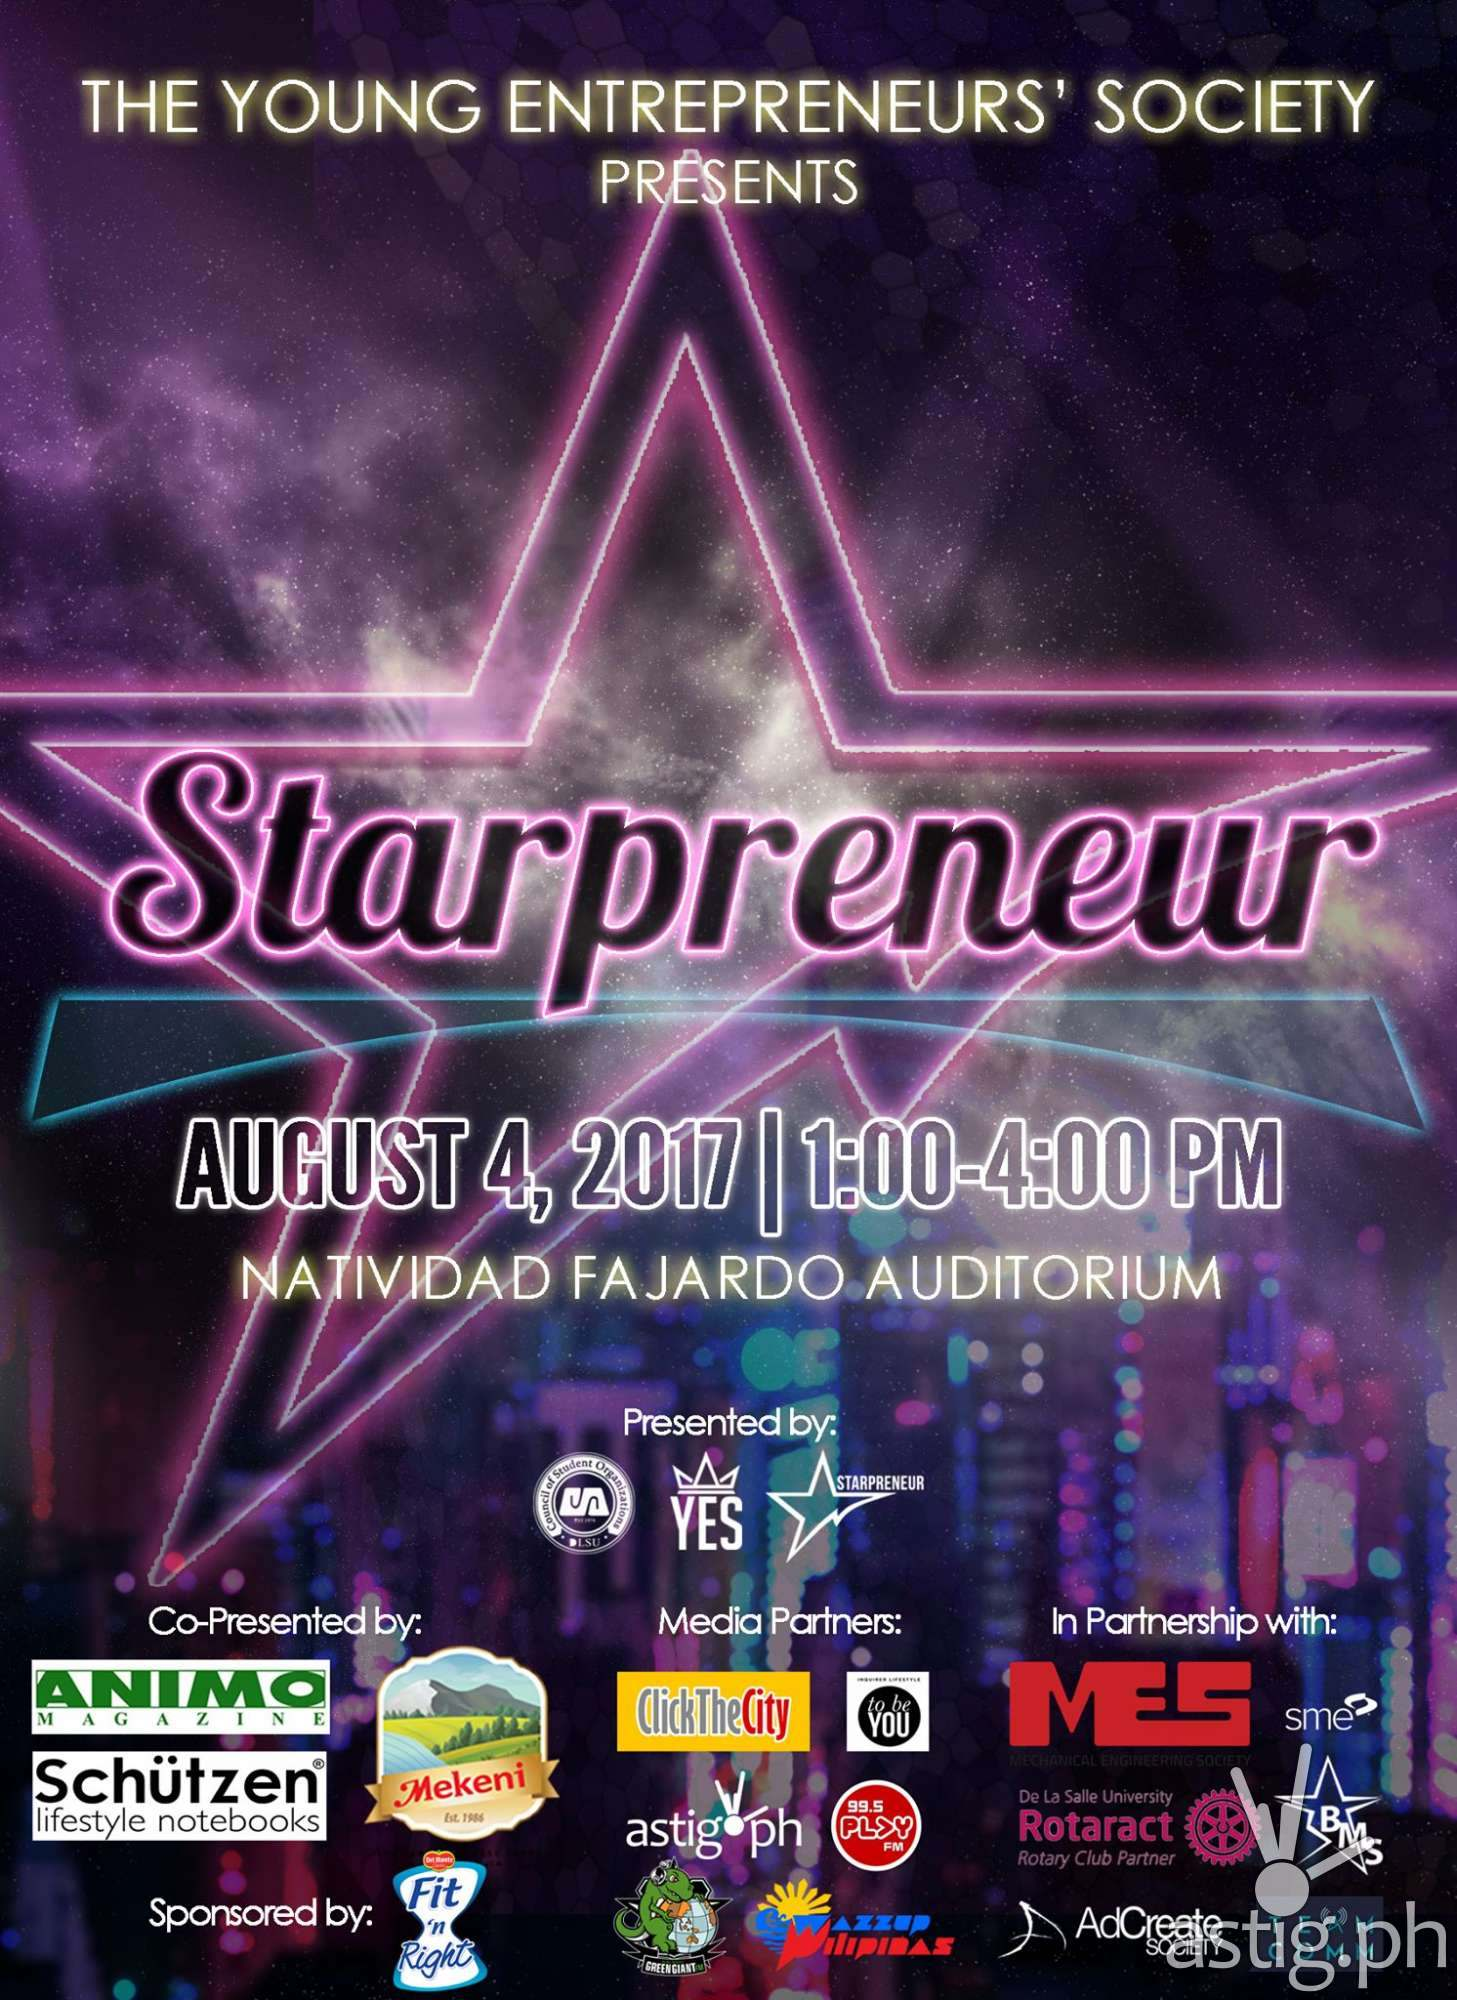 Starpreneur event poster